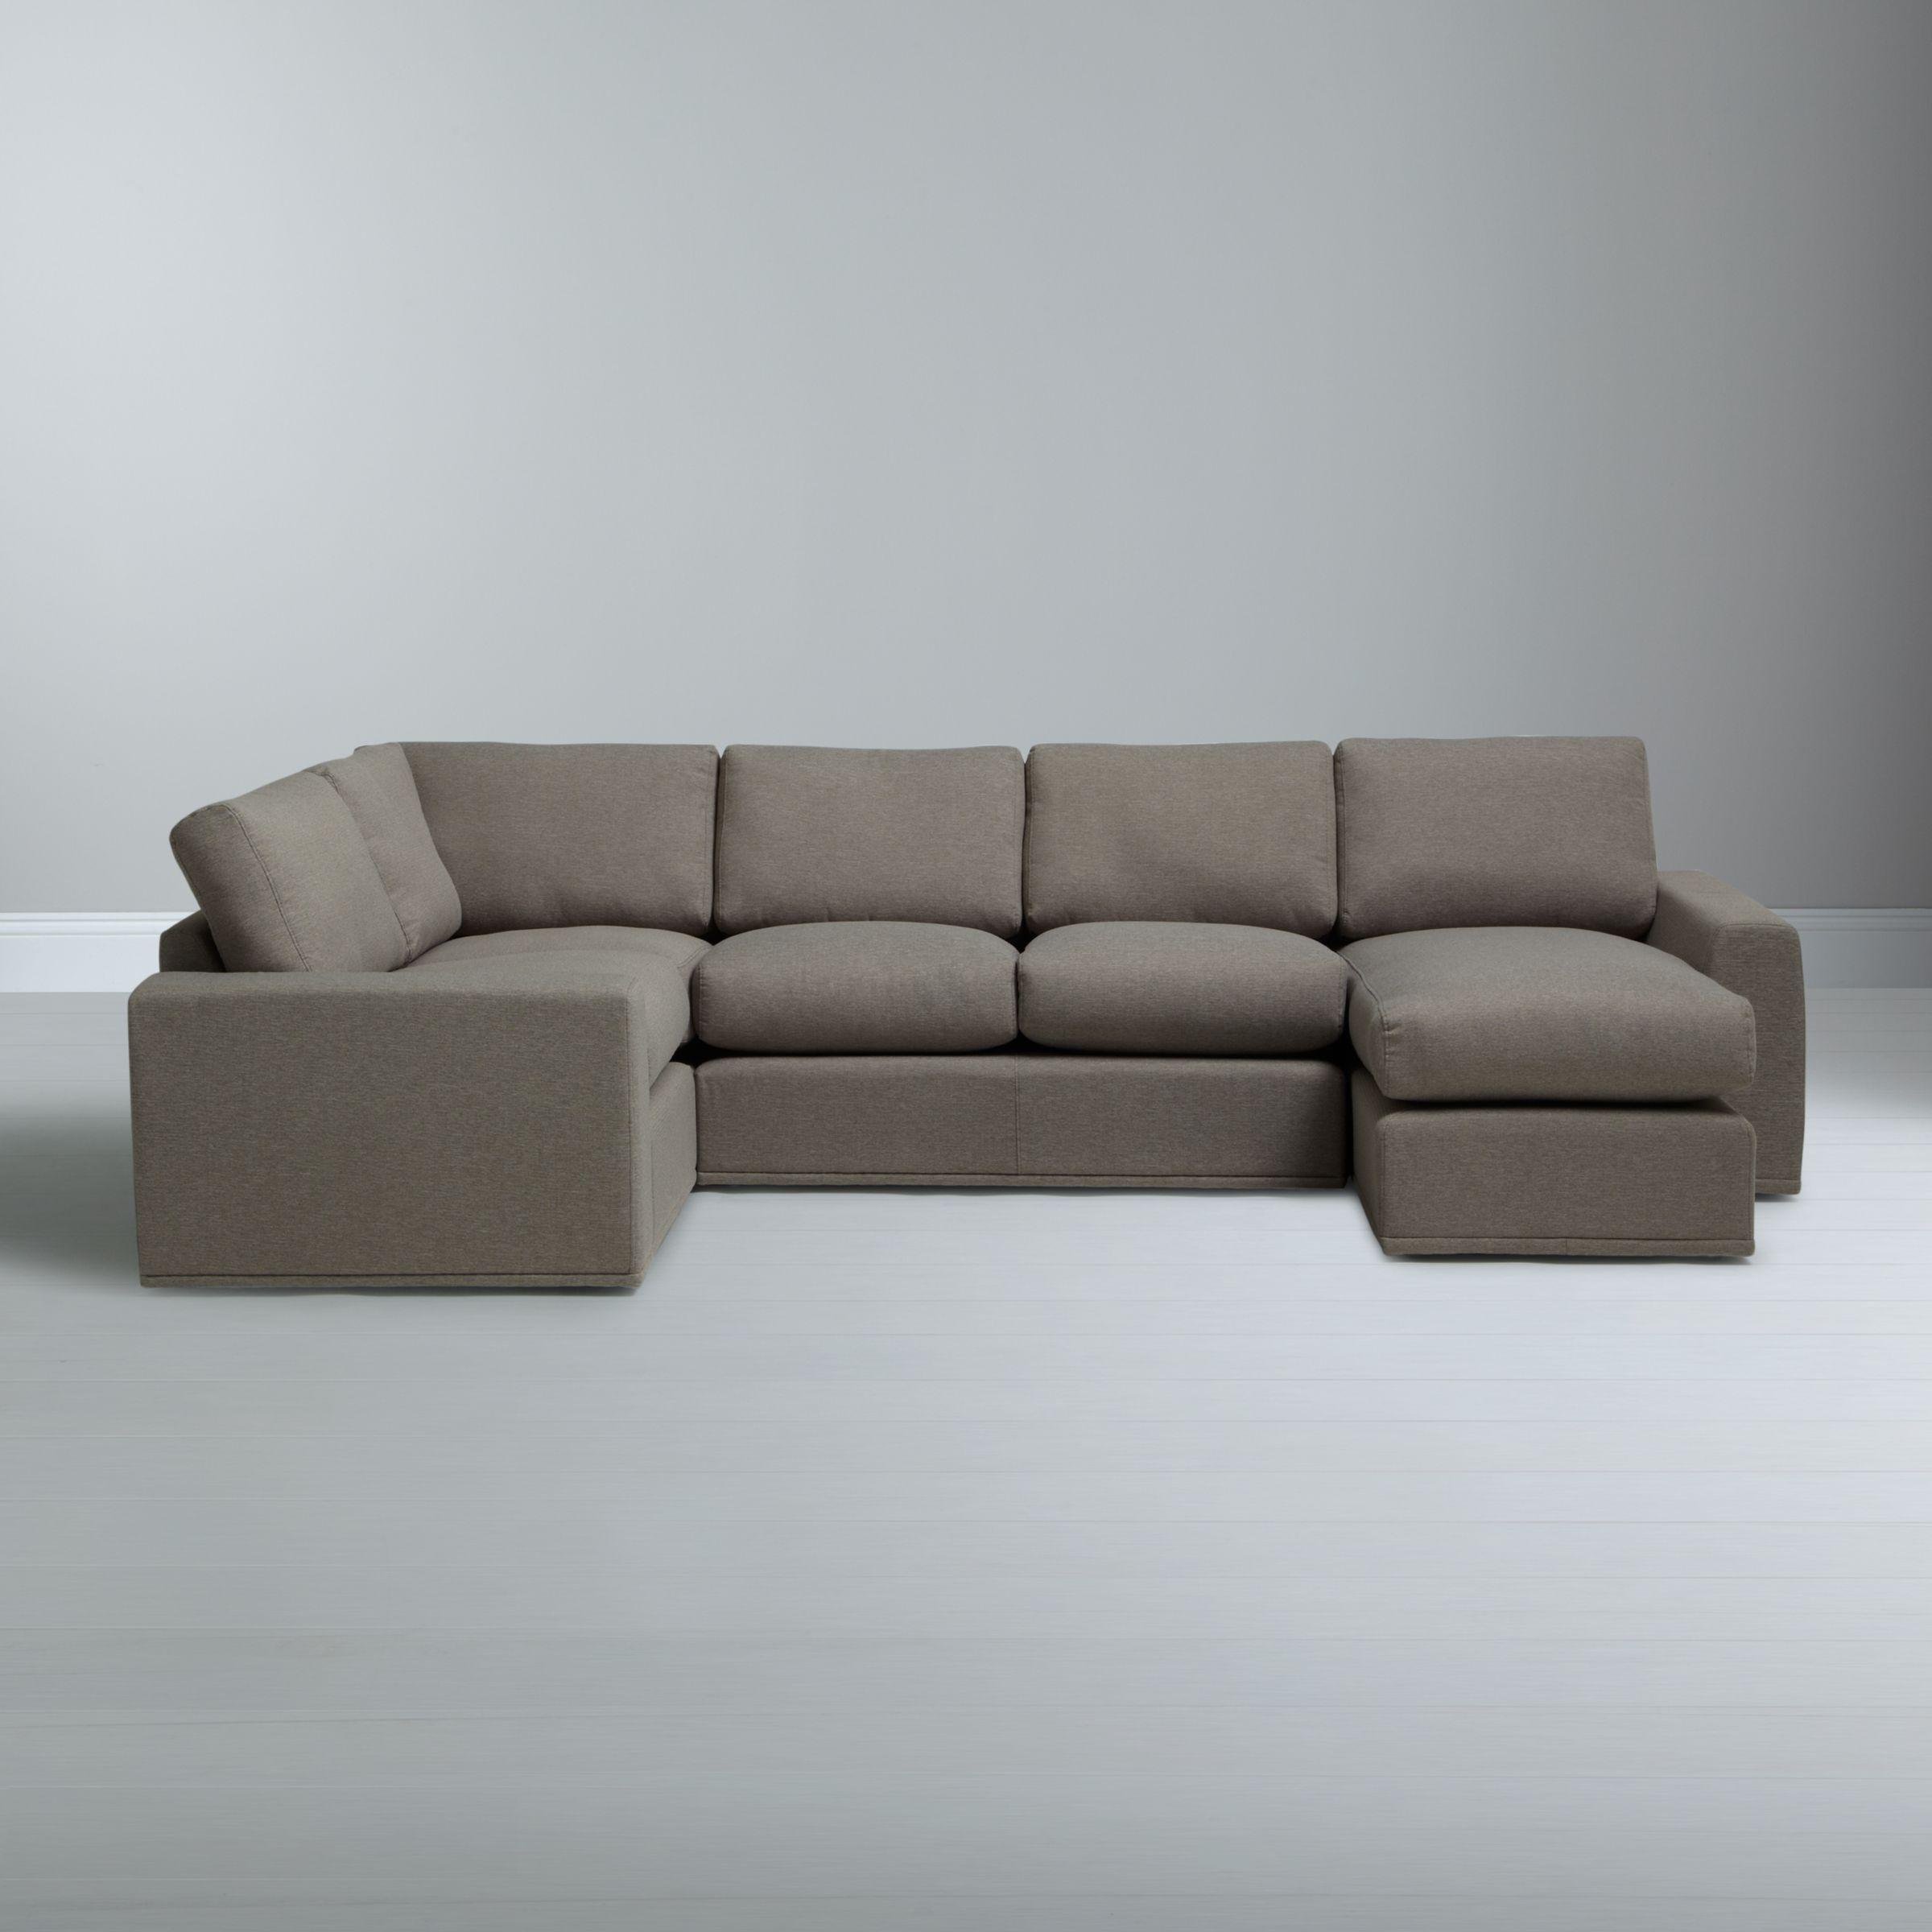 John Lewis Finlay Corner Sofa: Buy Cheap Lewis Corner Sofa